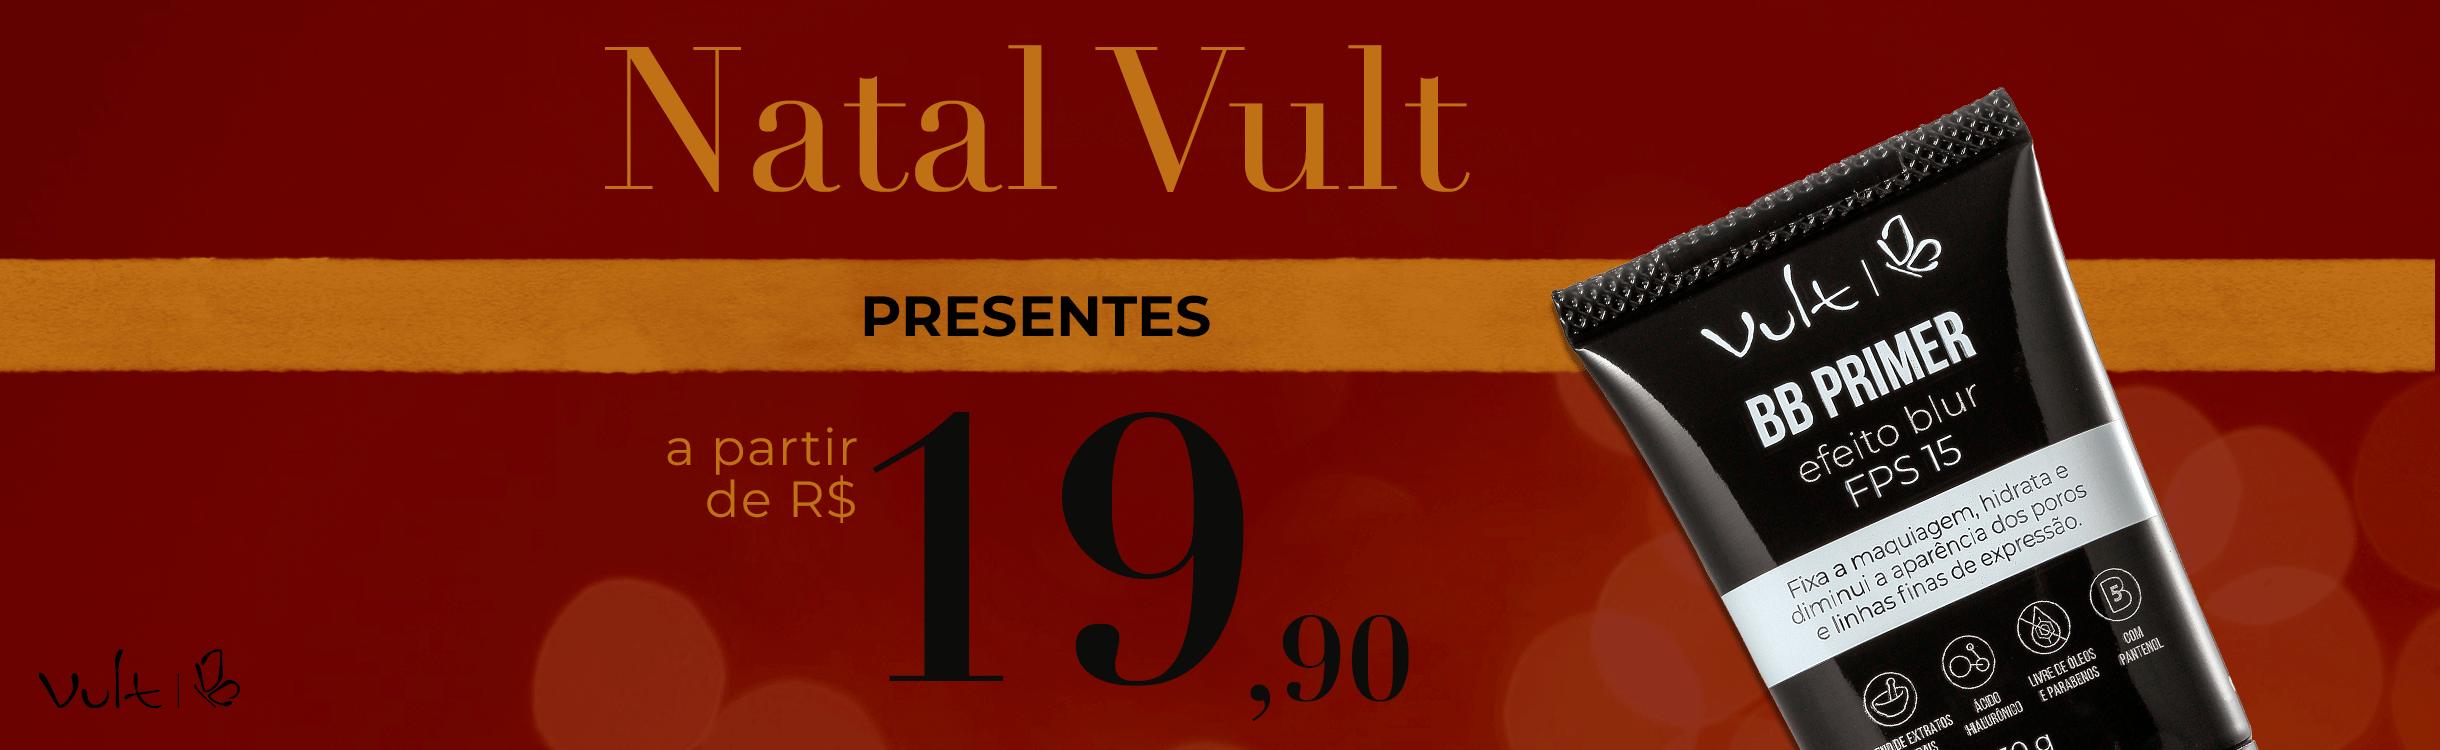 Presentes a partir de R$19,90